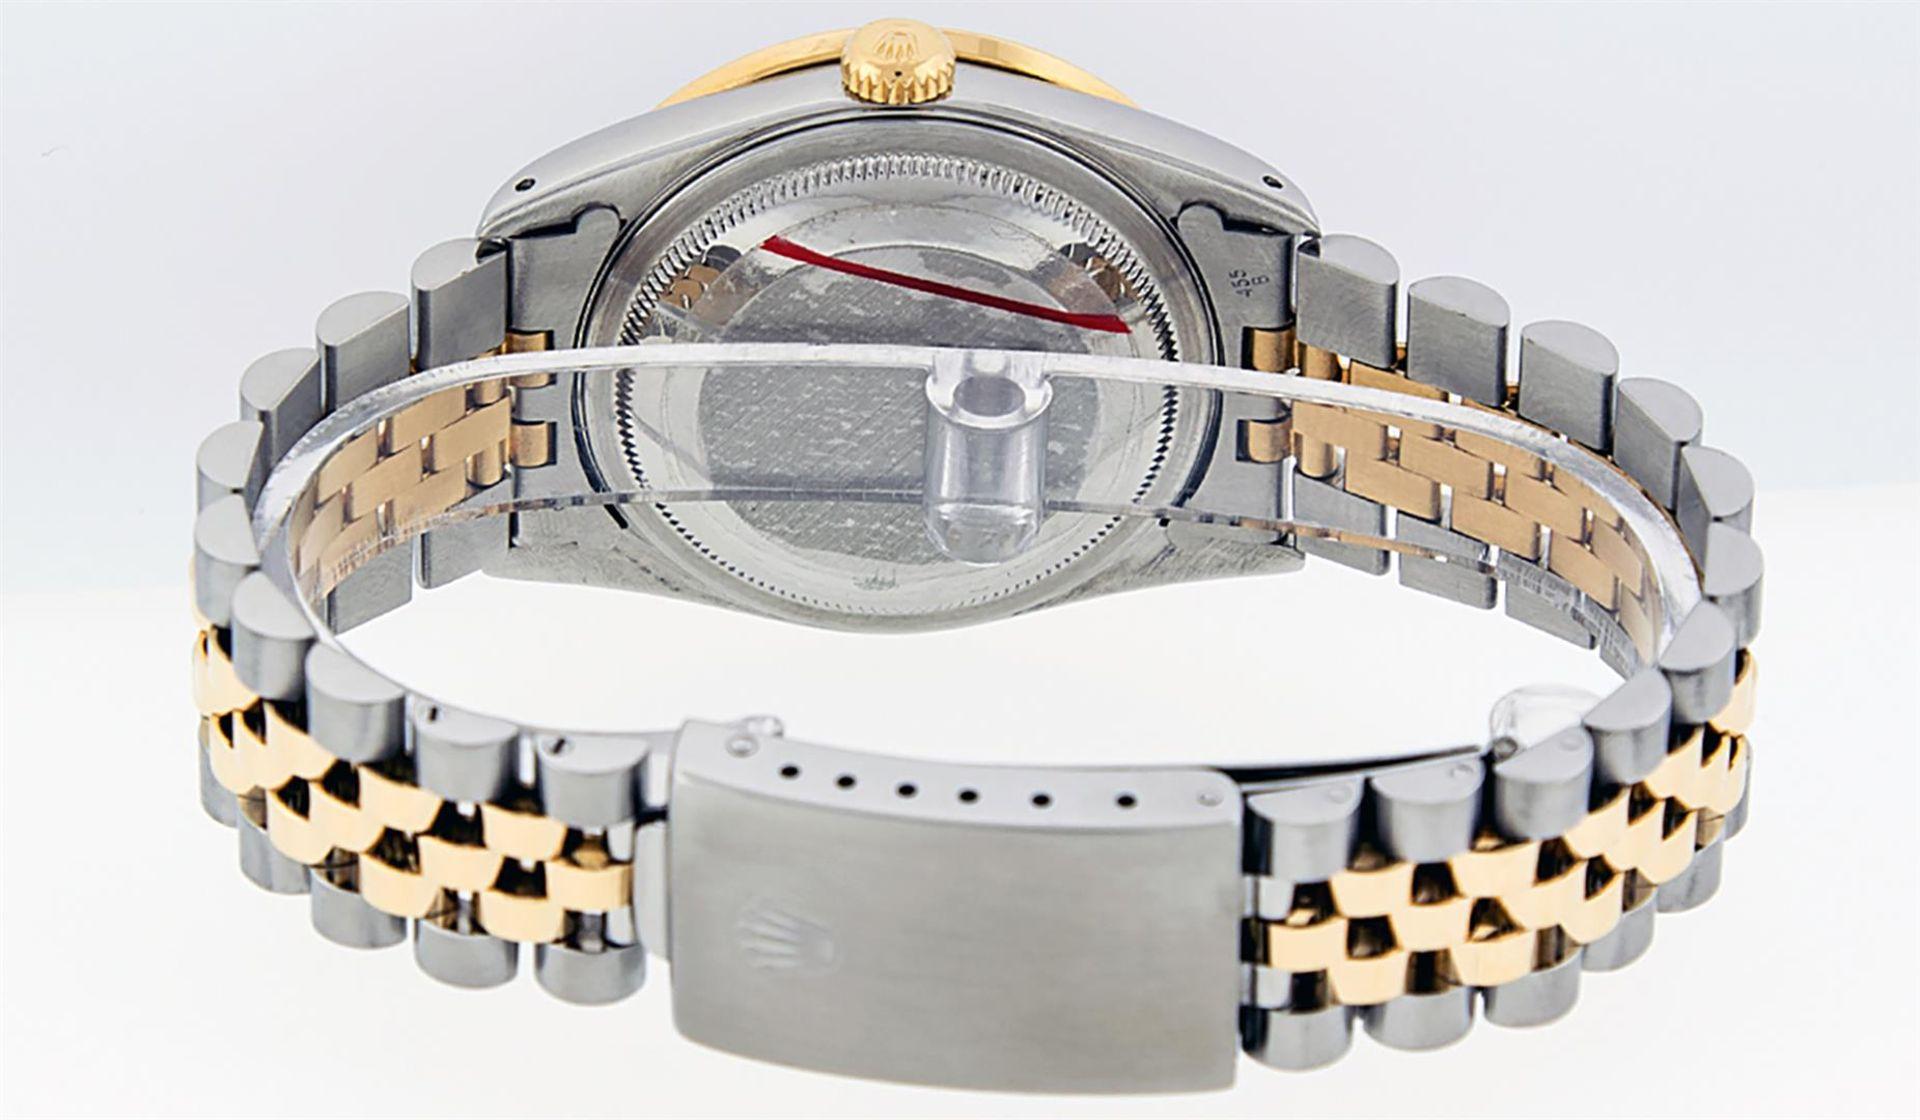 Rolex Mens 2 Tone Blue Vignette String Diamond Lugs Datejust Wristwatch - Image 5 of 8